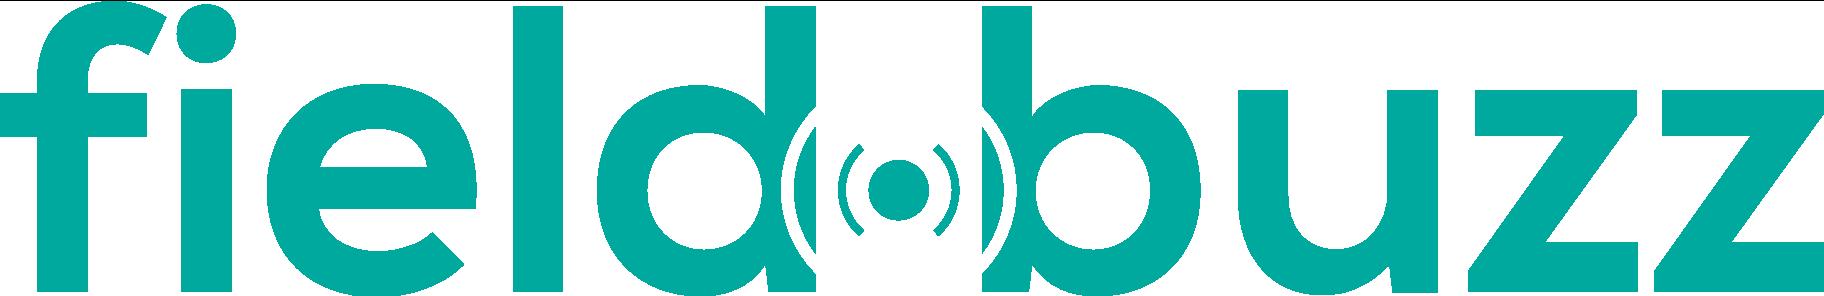 Field Buzz logo